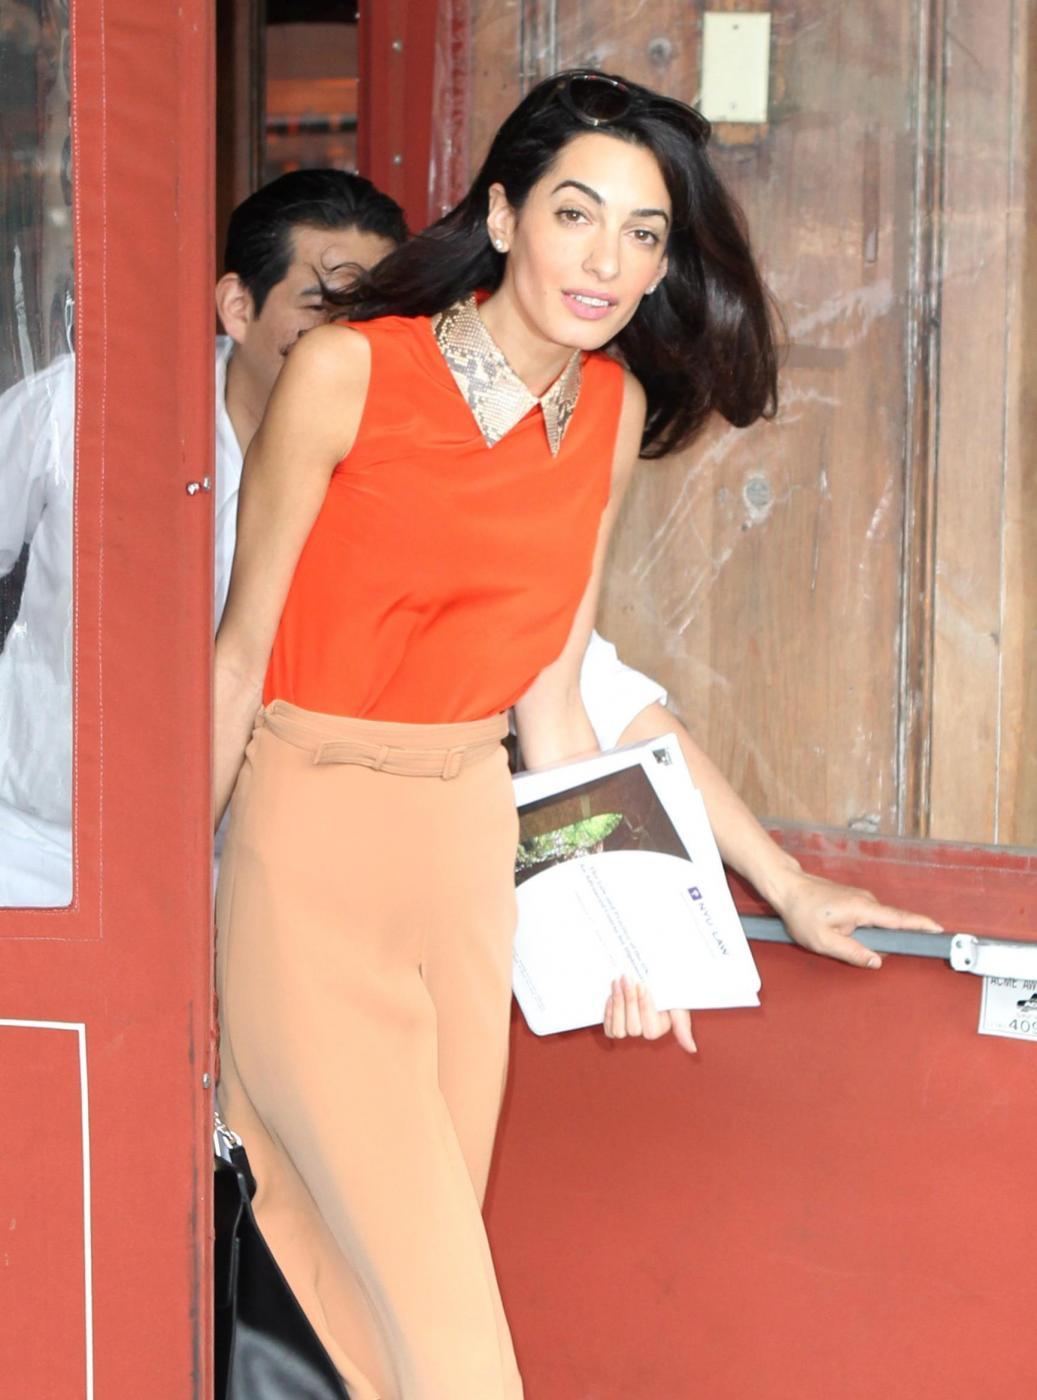 Amal Alamuddin magrissima, lady Clooney quasi scheletrica FOTO 3